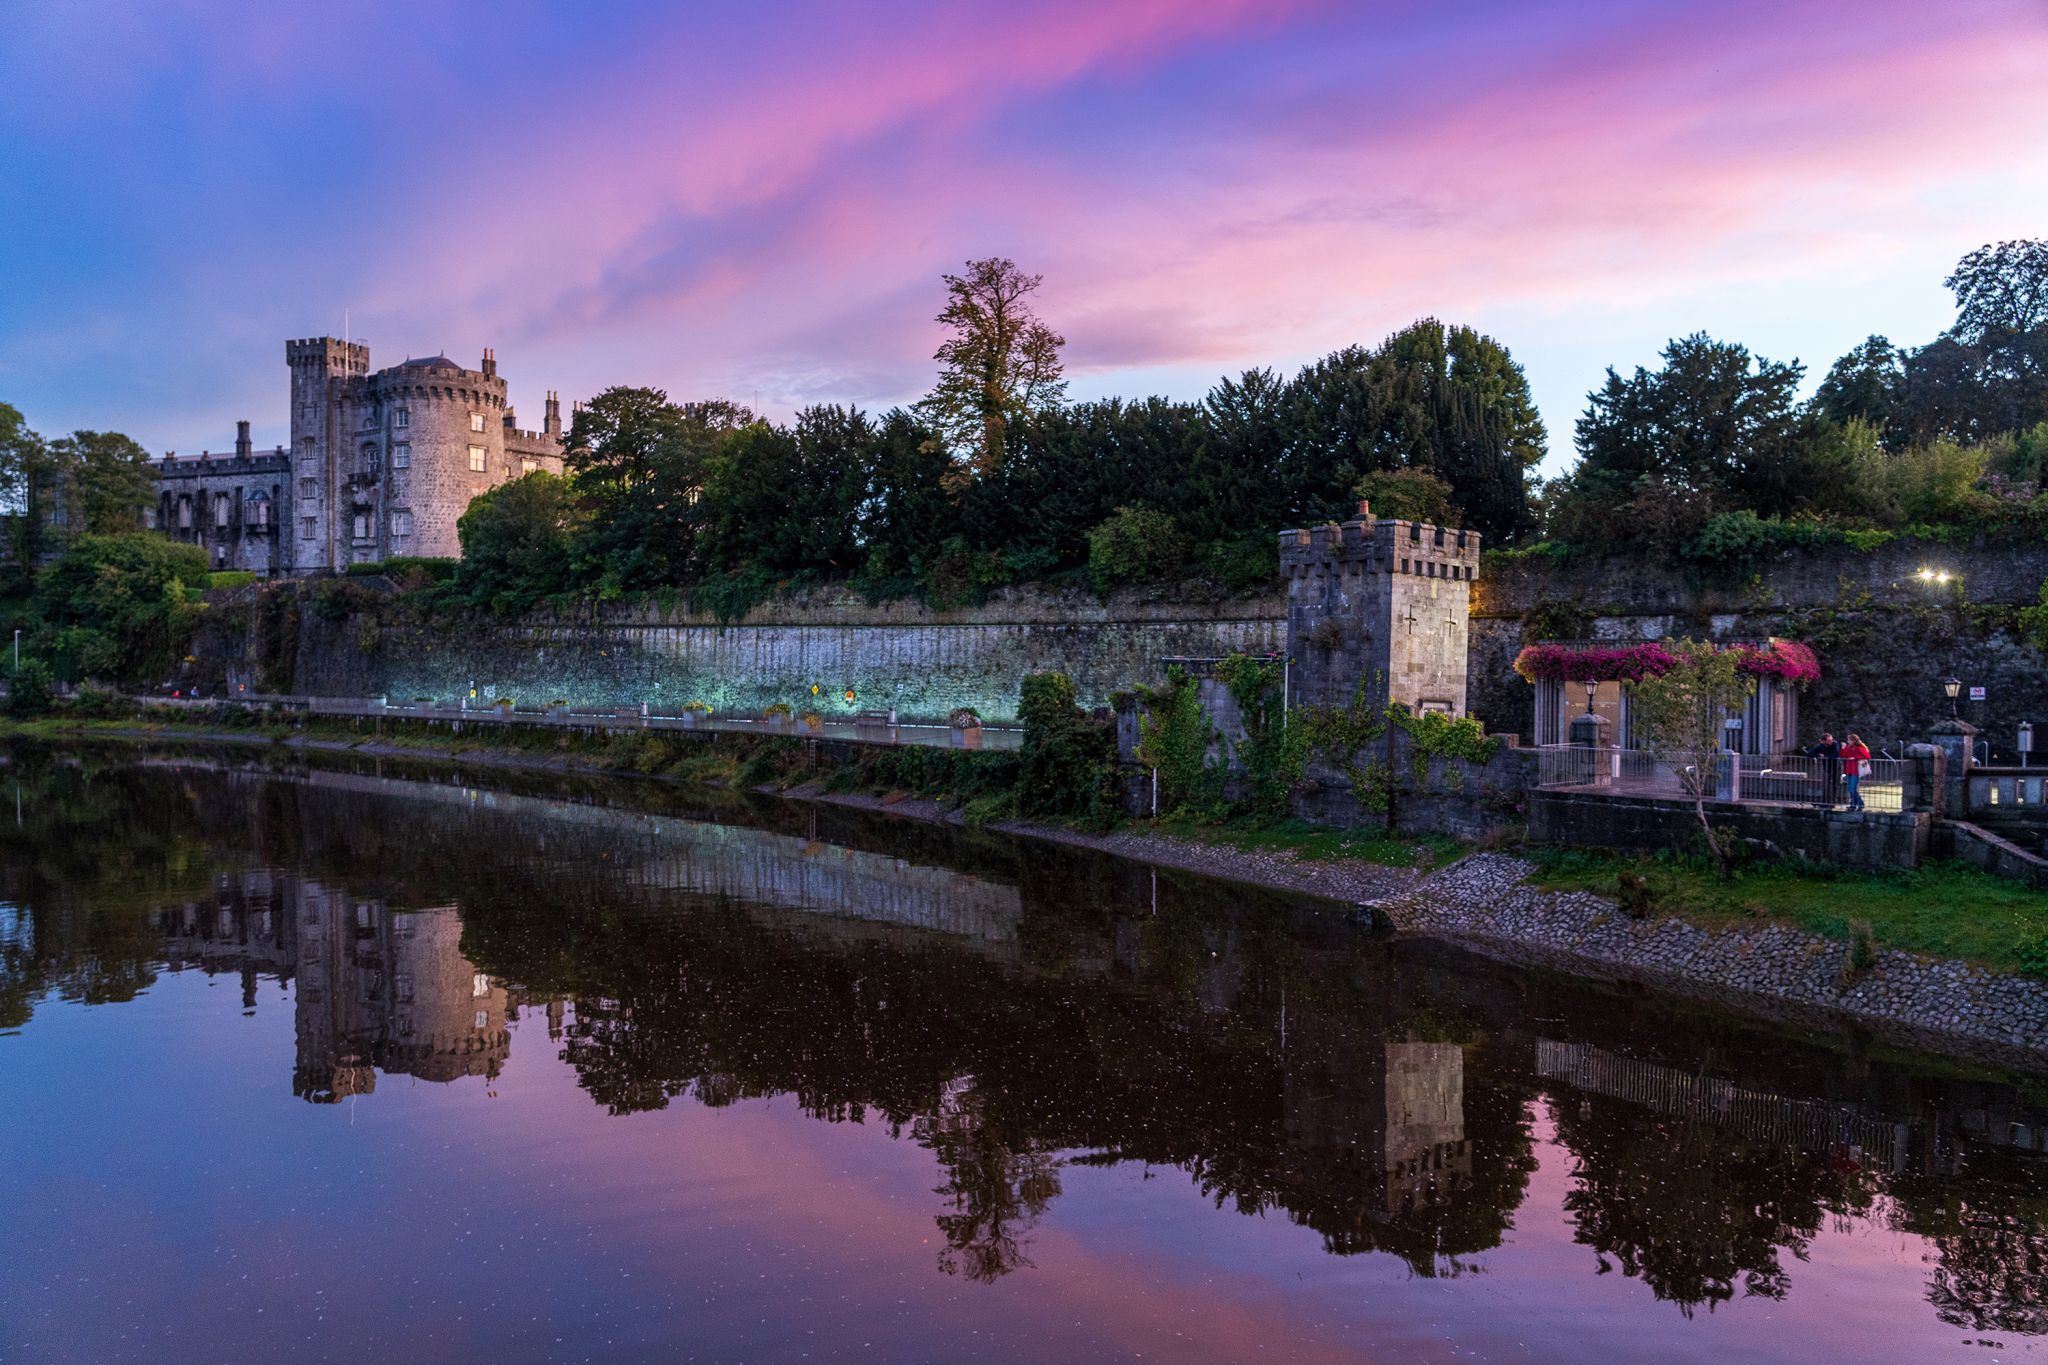 St John's Bridge/Kilkenny Castle, Ireland